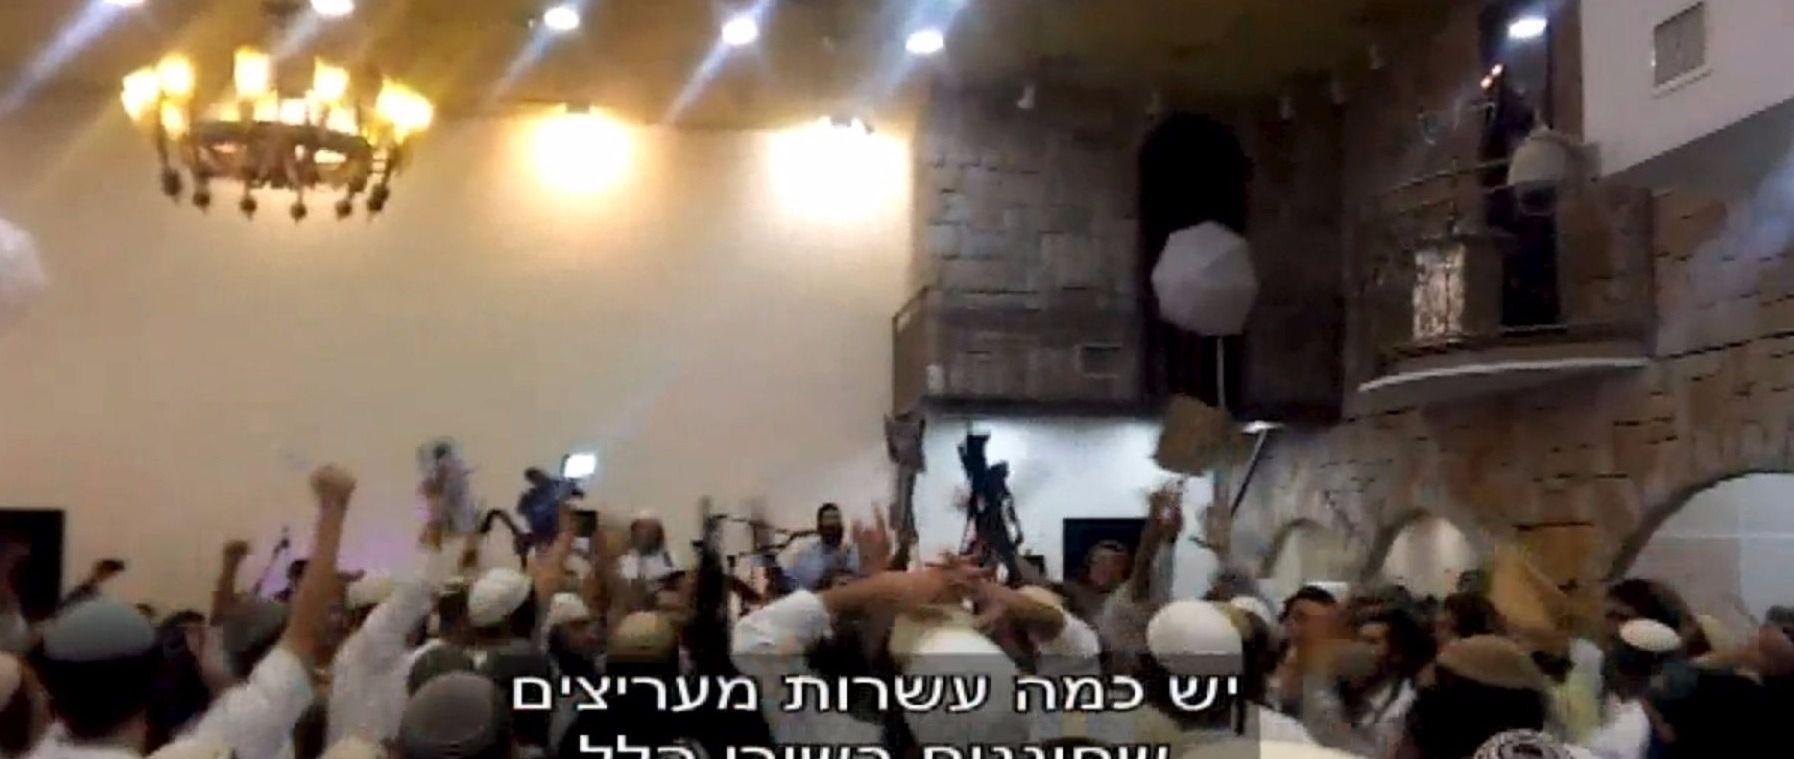 Westbank Firebombing: Right-wing extremists celebrate Duma murders.